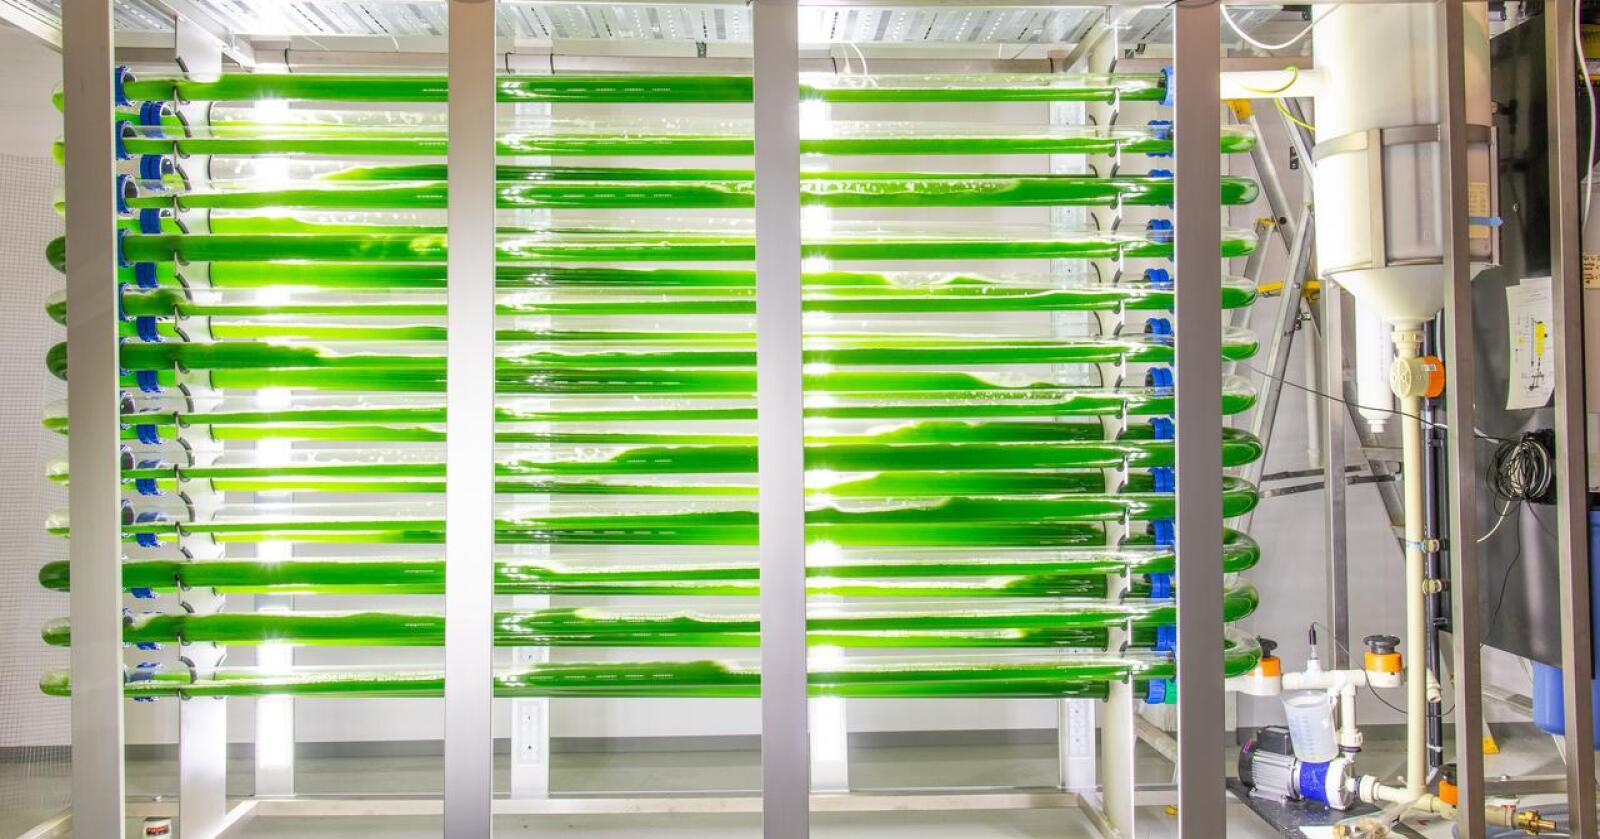 Bildet viser en bioreaktor med mikroalger på Ås. (Foto: Erling Fløistad, Nibio)